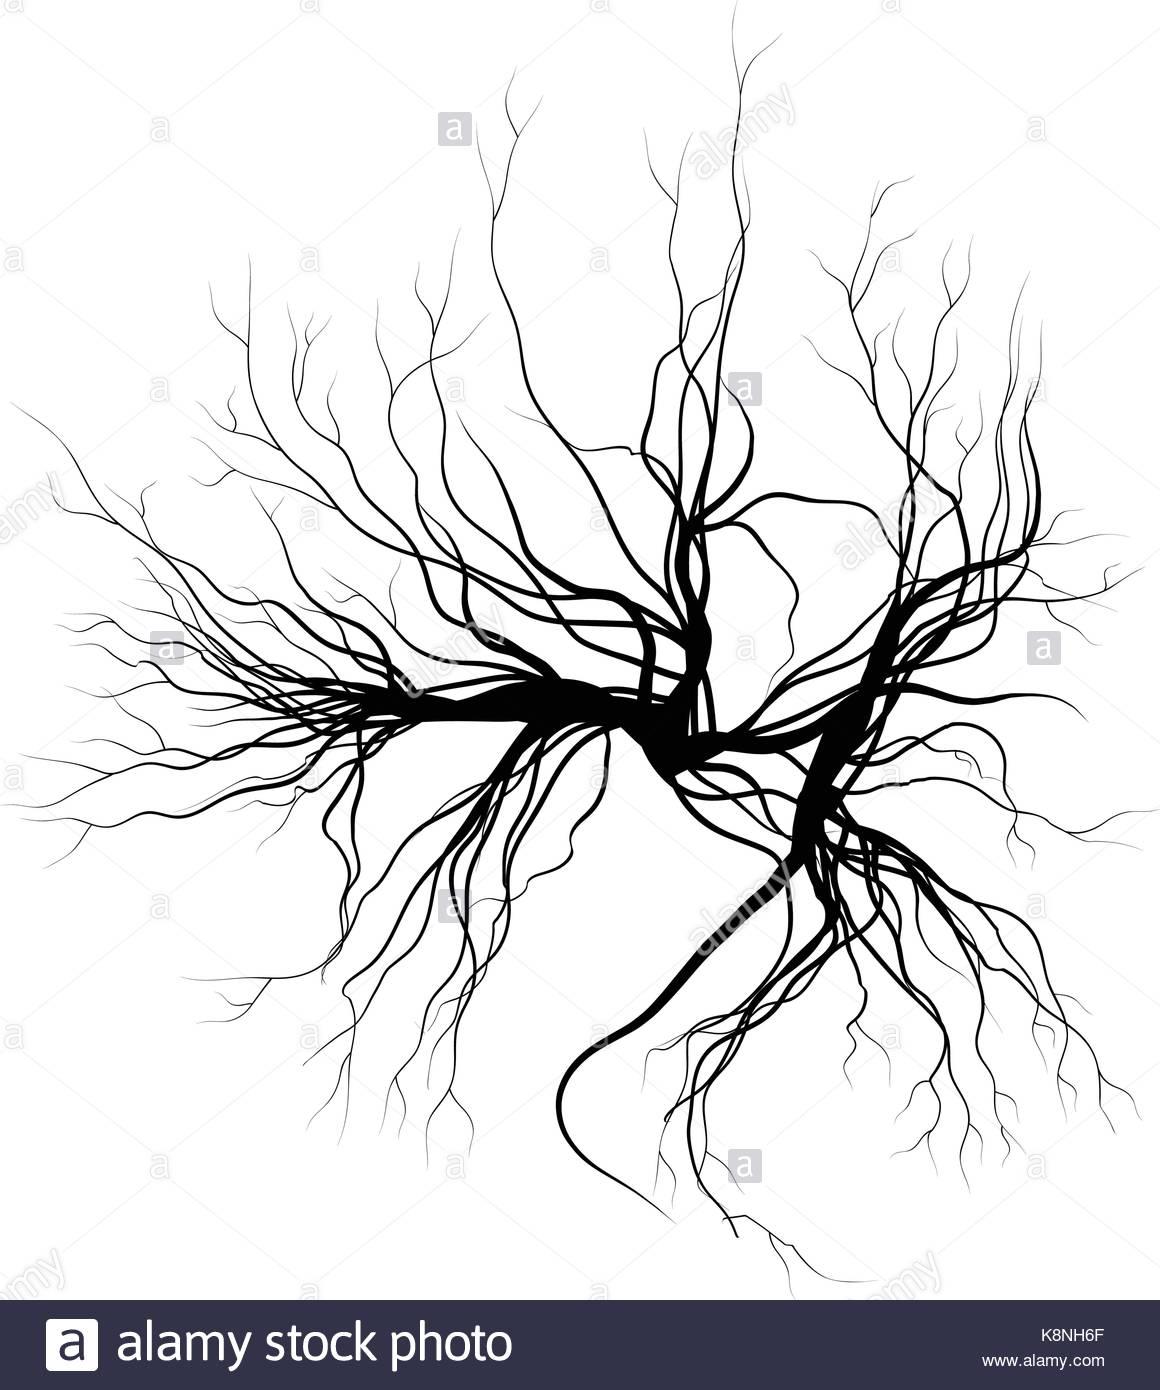 1160x1390 Human Veins, Red Blood Vessels Design. Vector Illustration